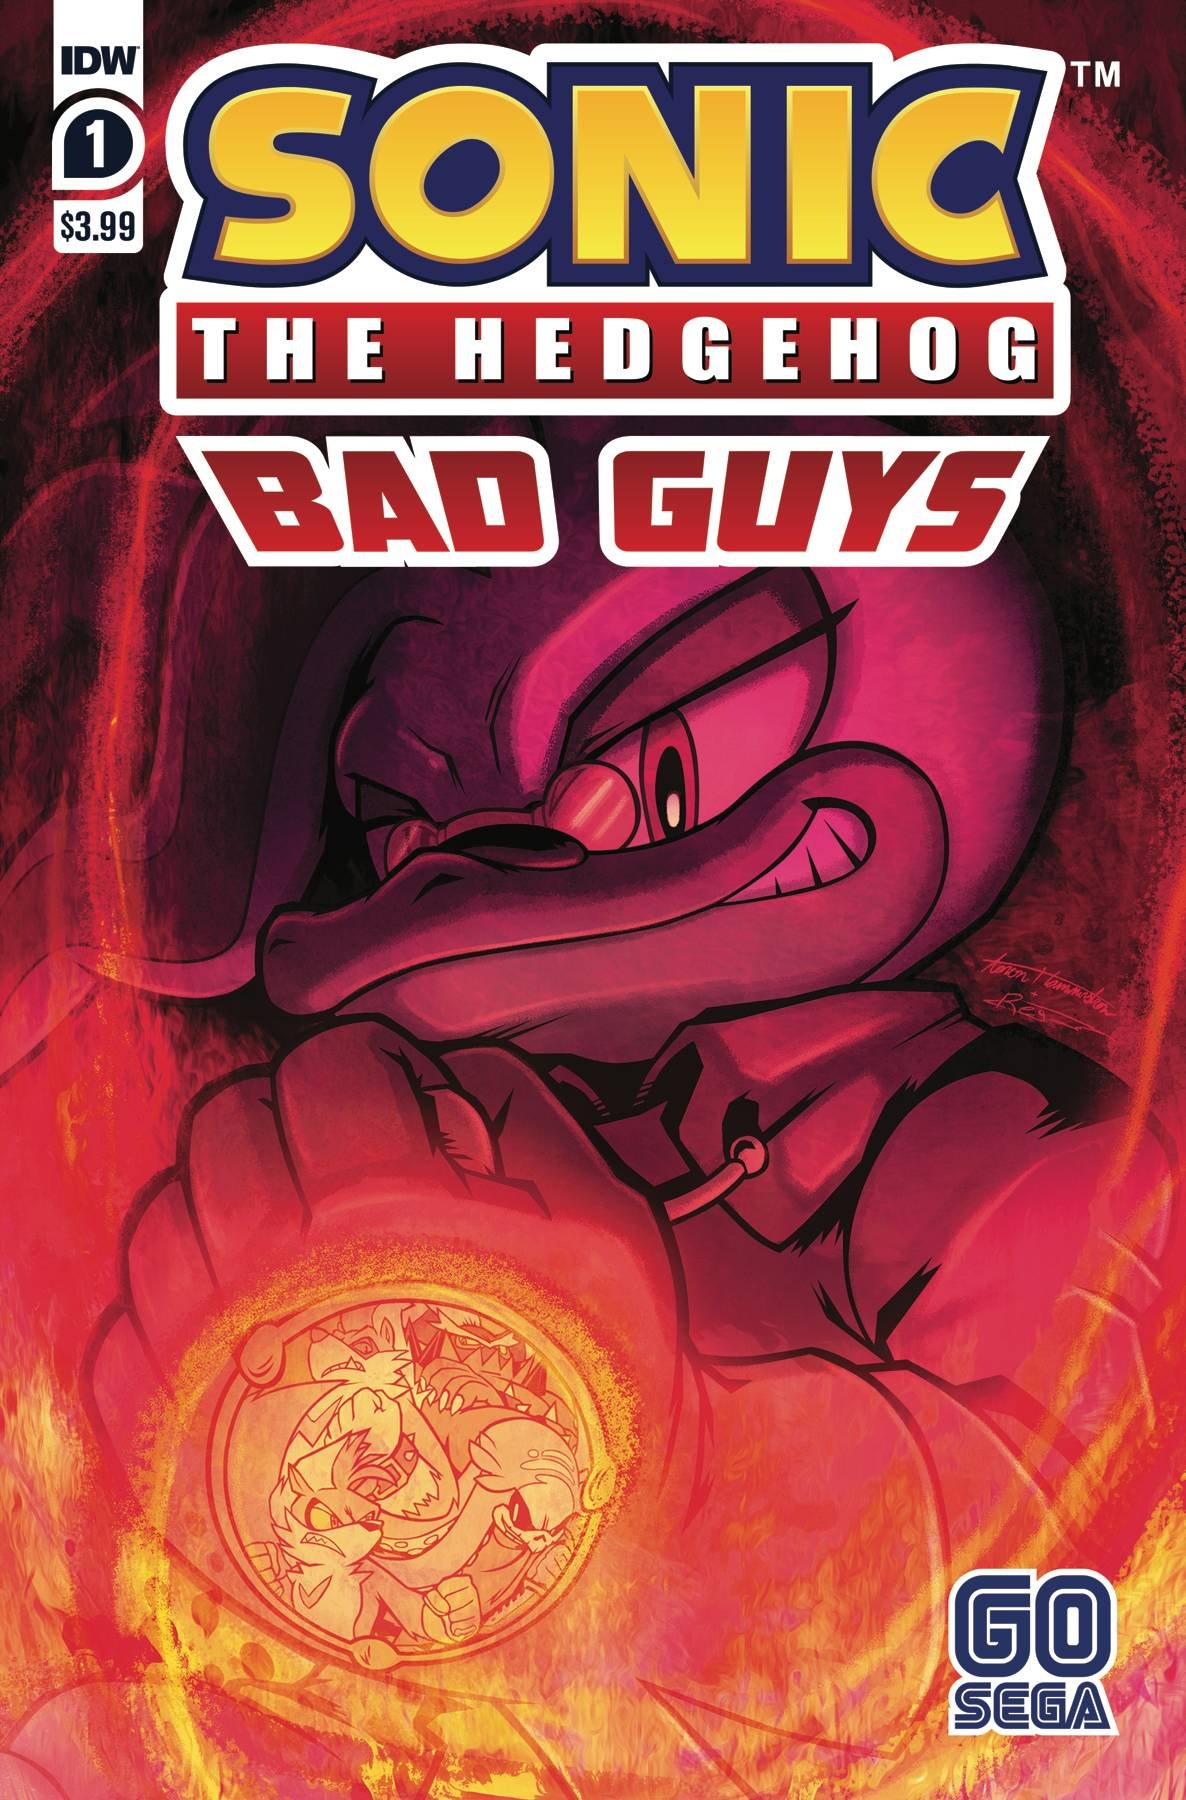 Jul200524 Sonic The Hedgehog Bad Guys 1 Of 4 Cvr A Hammerstrom Previews World